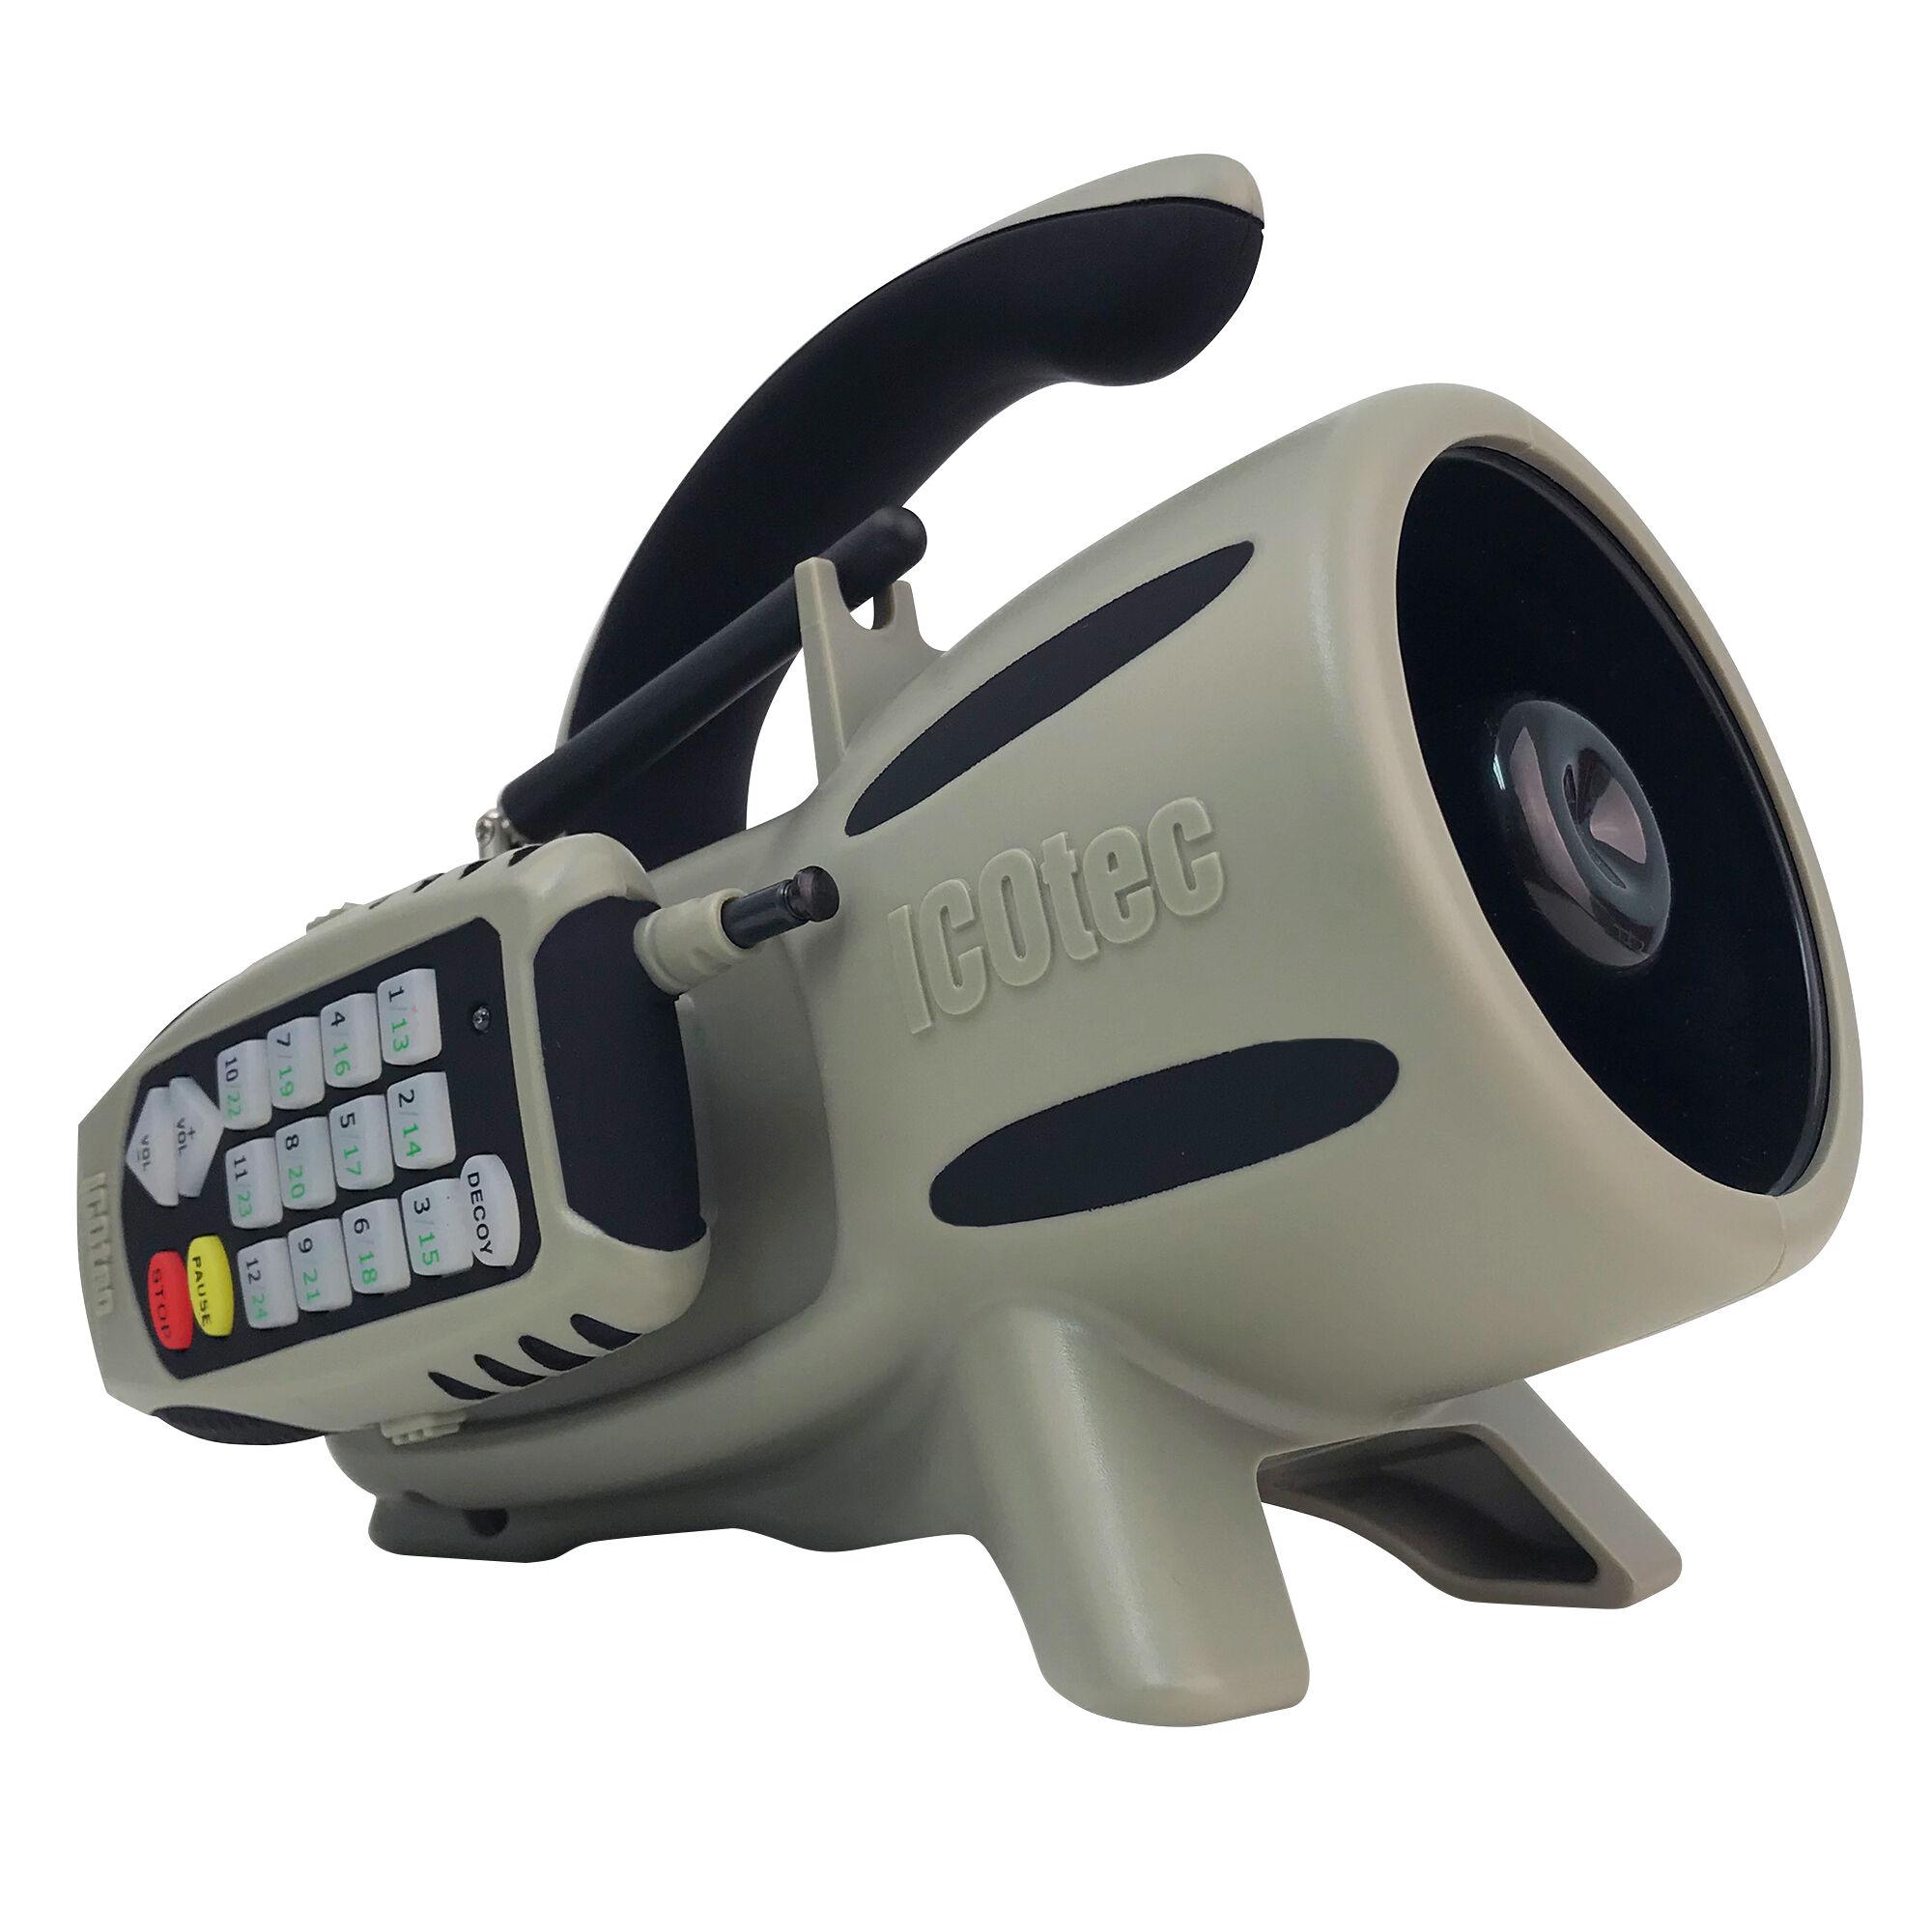 ICOtec Gen2 GC350 Programmable Game Call